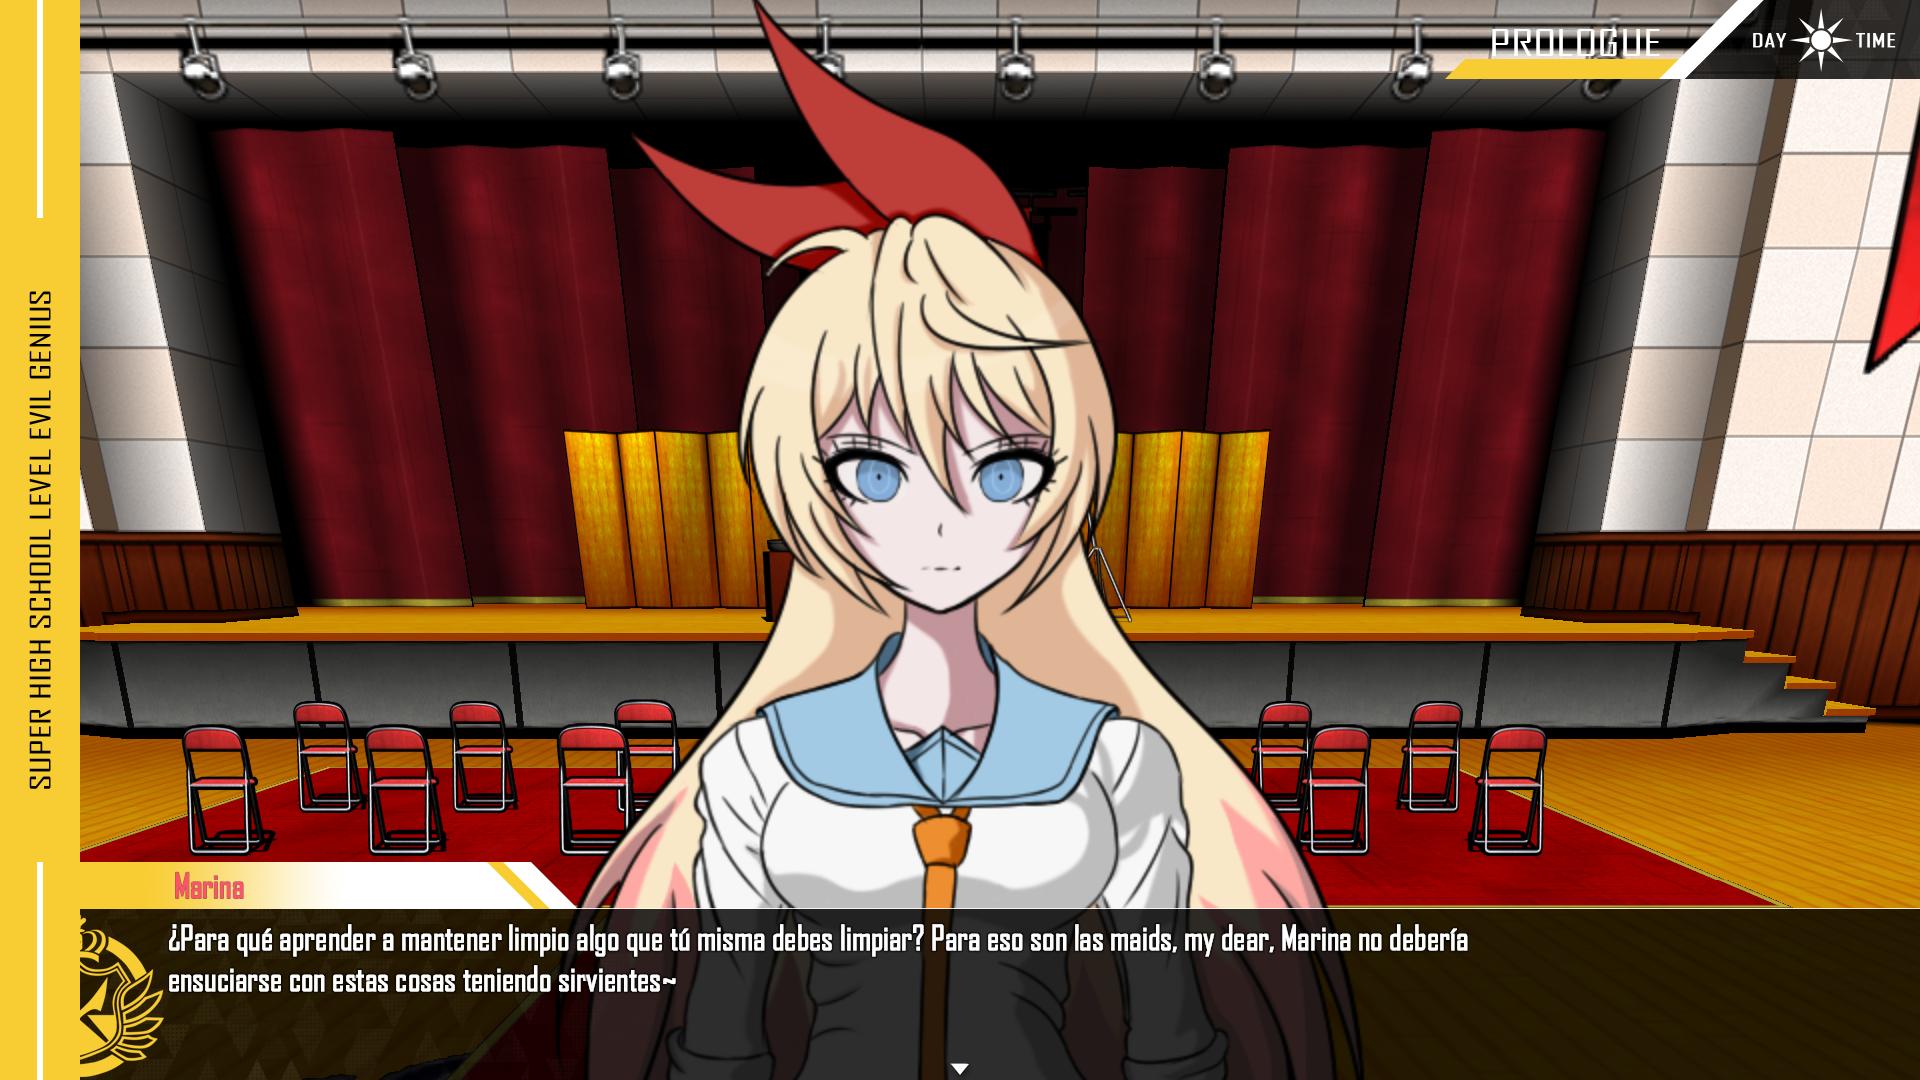 [RPG Maker MV] ☆ Danganronpa: Welcome Back Despair ☆ by Nokori Project™ Mmmmarina_test_by_i_angiee-dagpkla